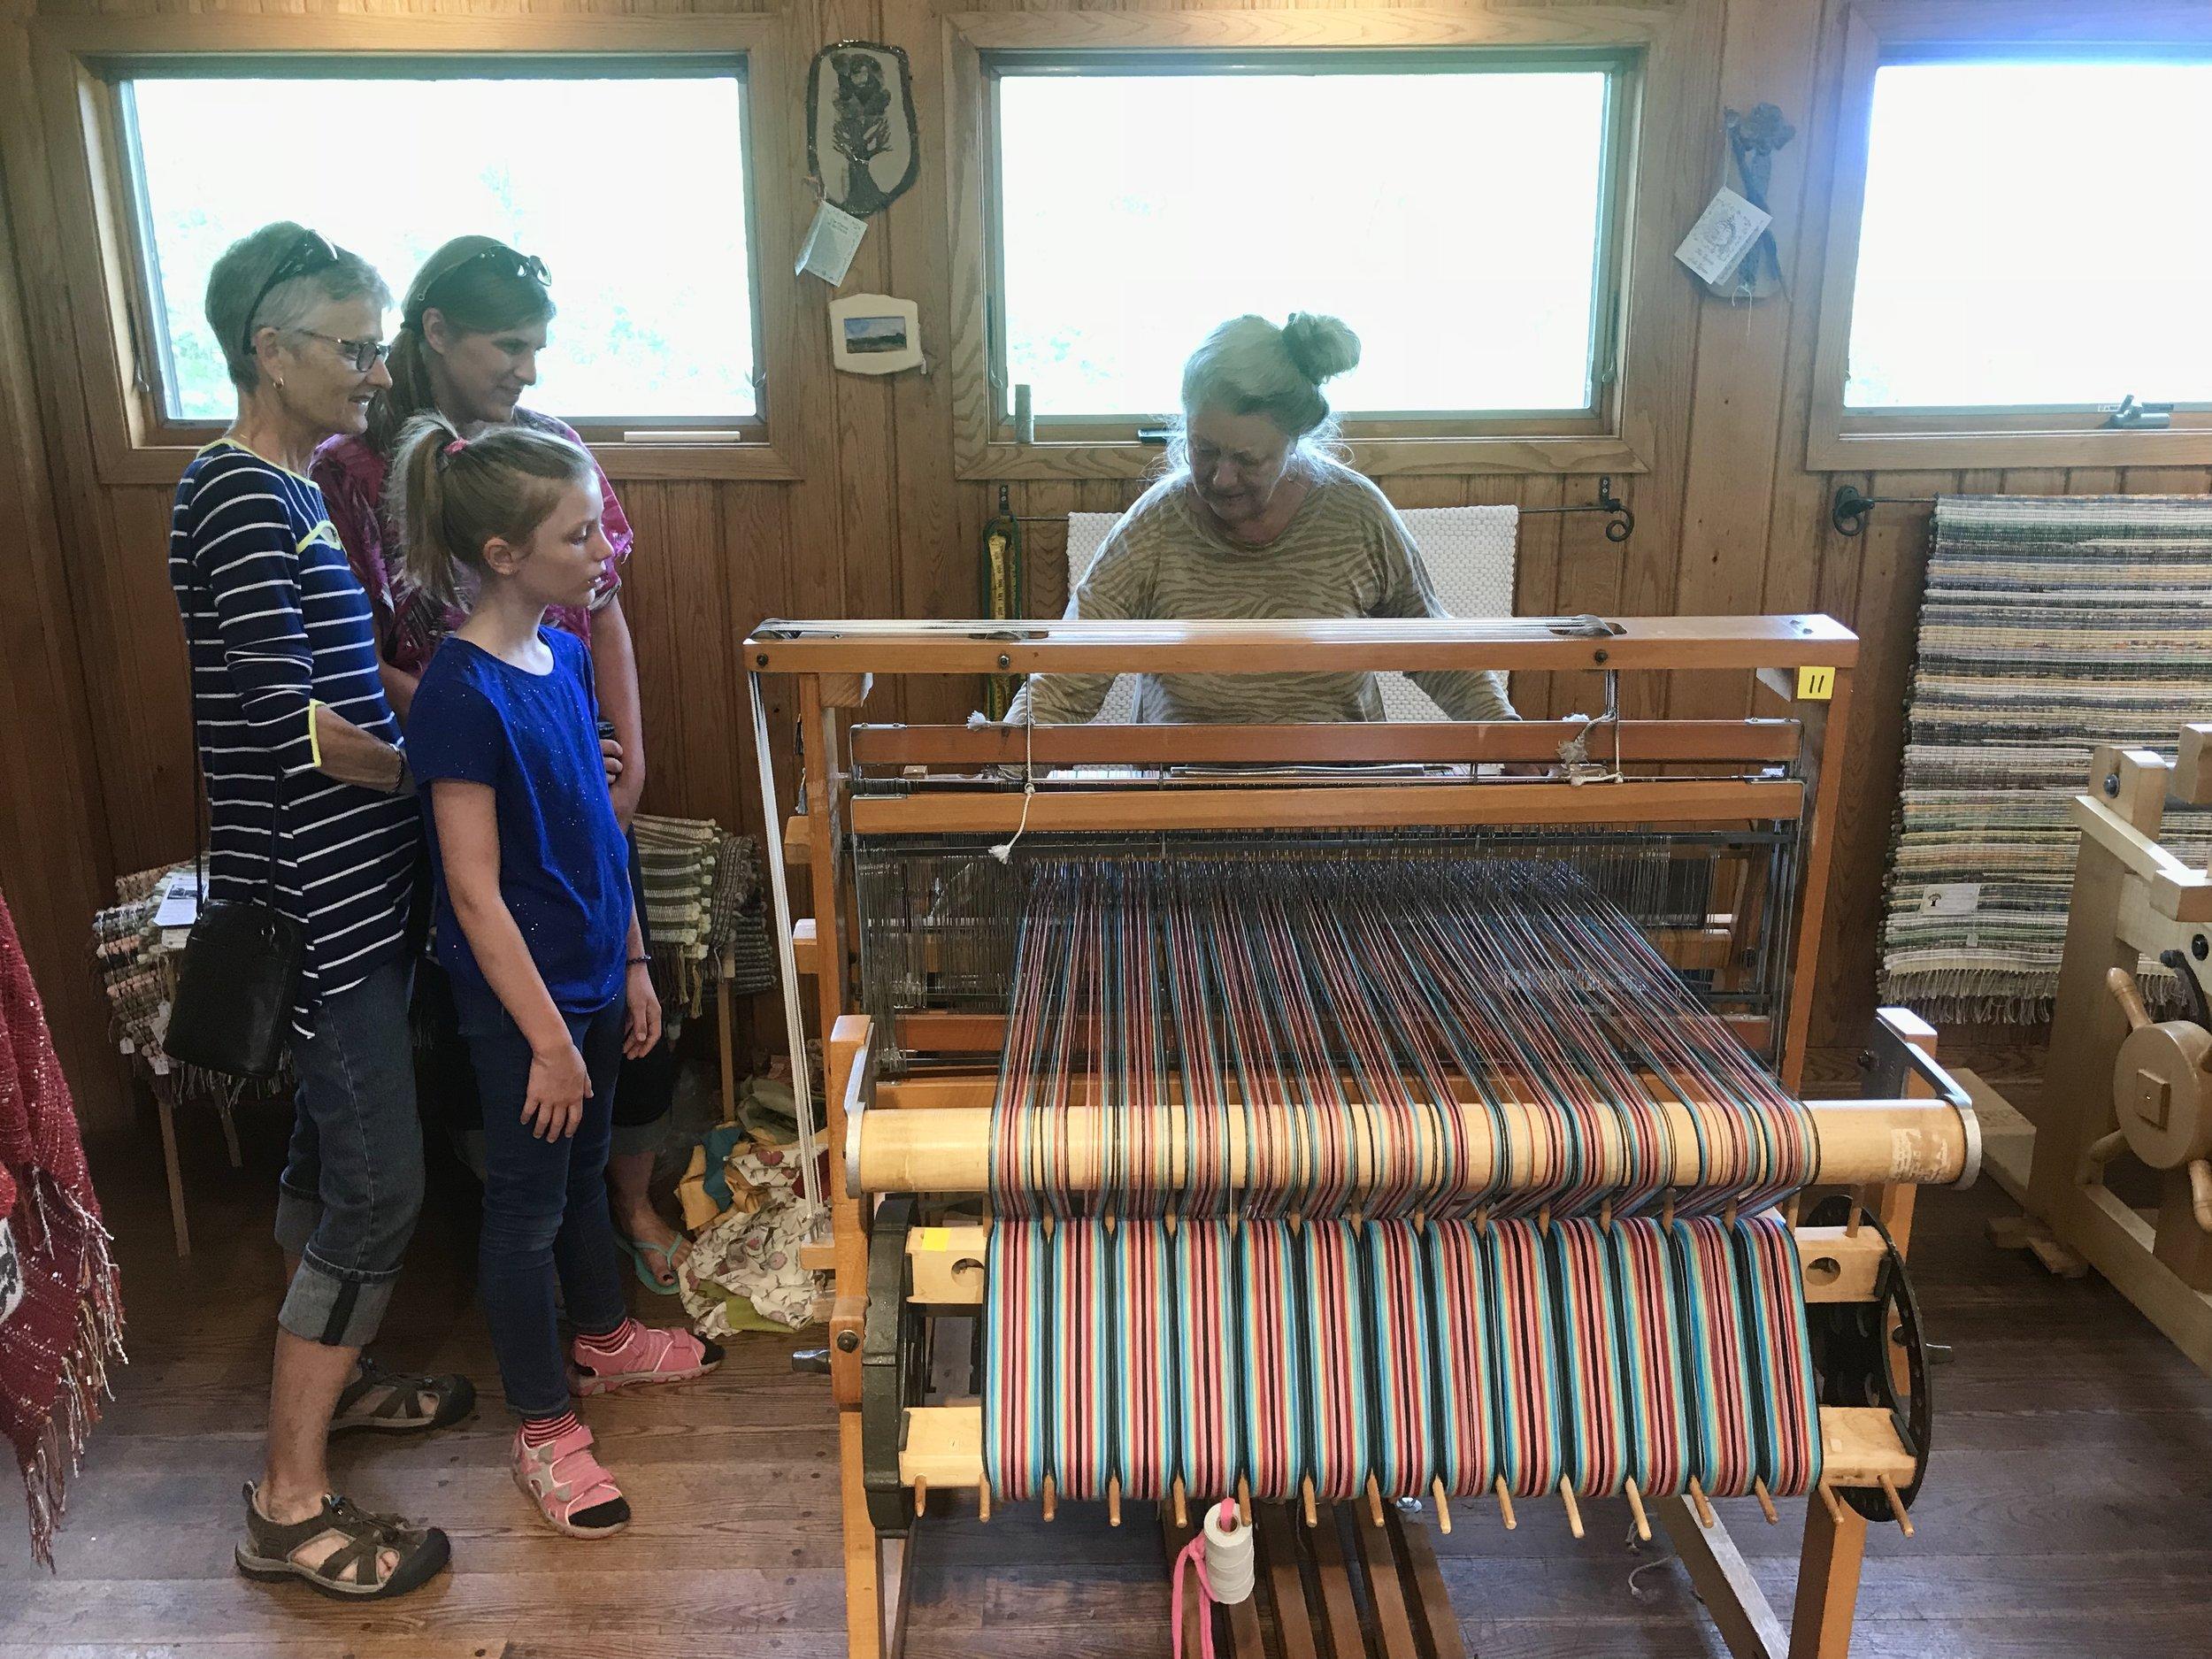 Susan Sabre weaves a rug as patrons watch this impromptu weaving demonstration.